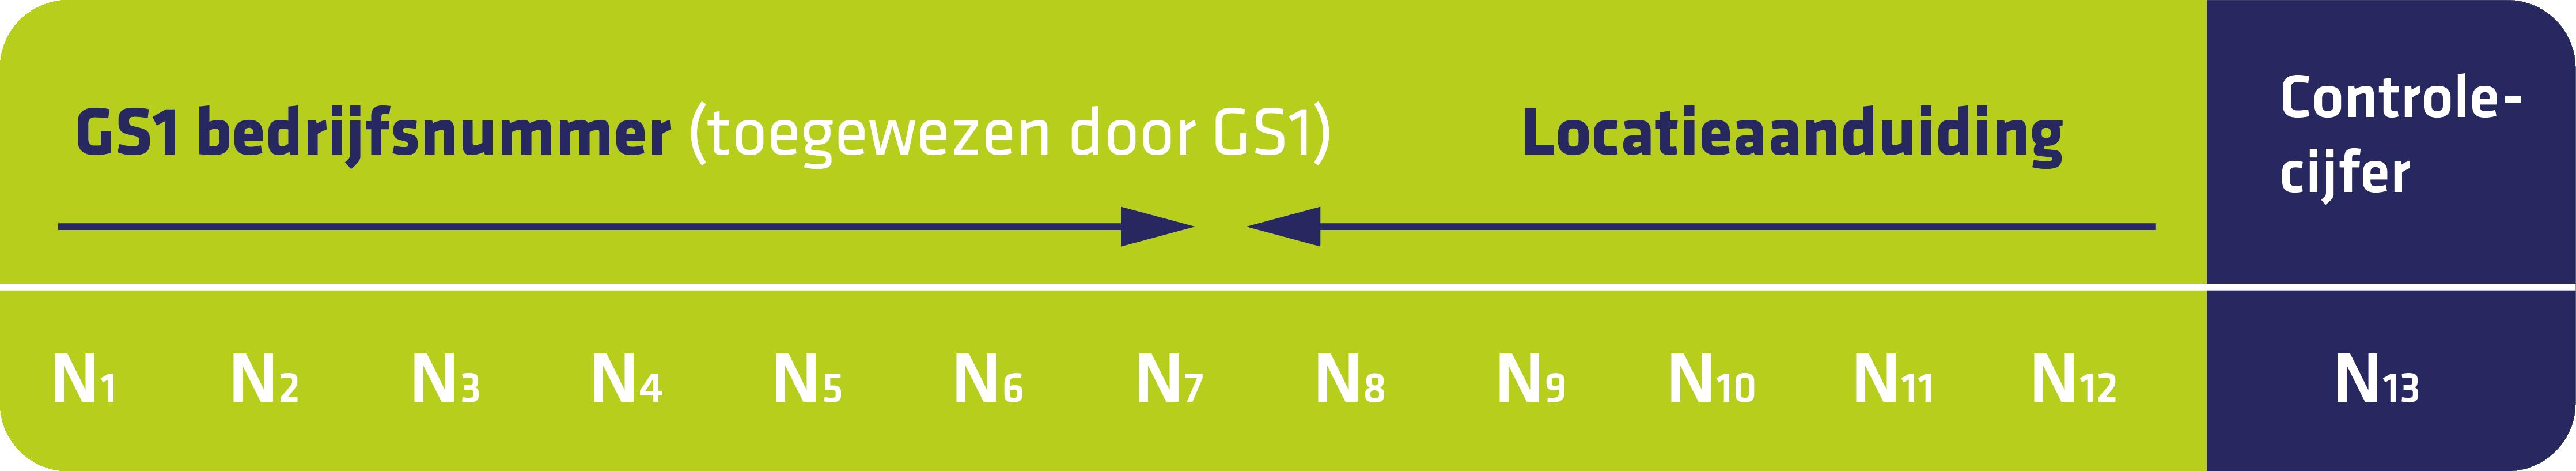 GS1-Bedrijfsnummer